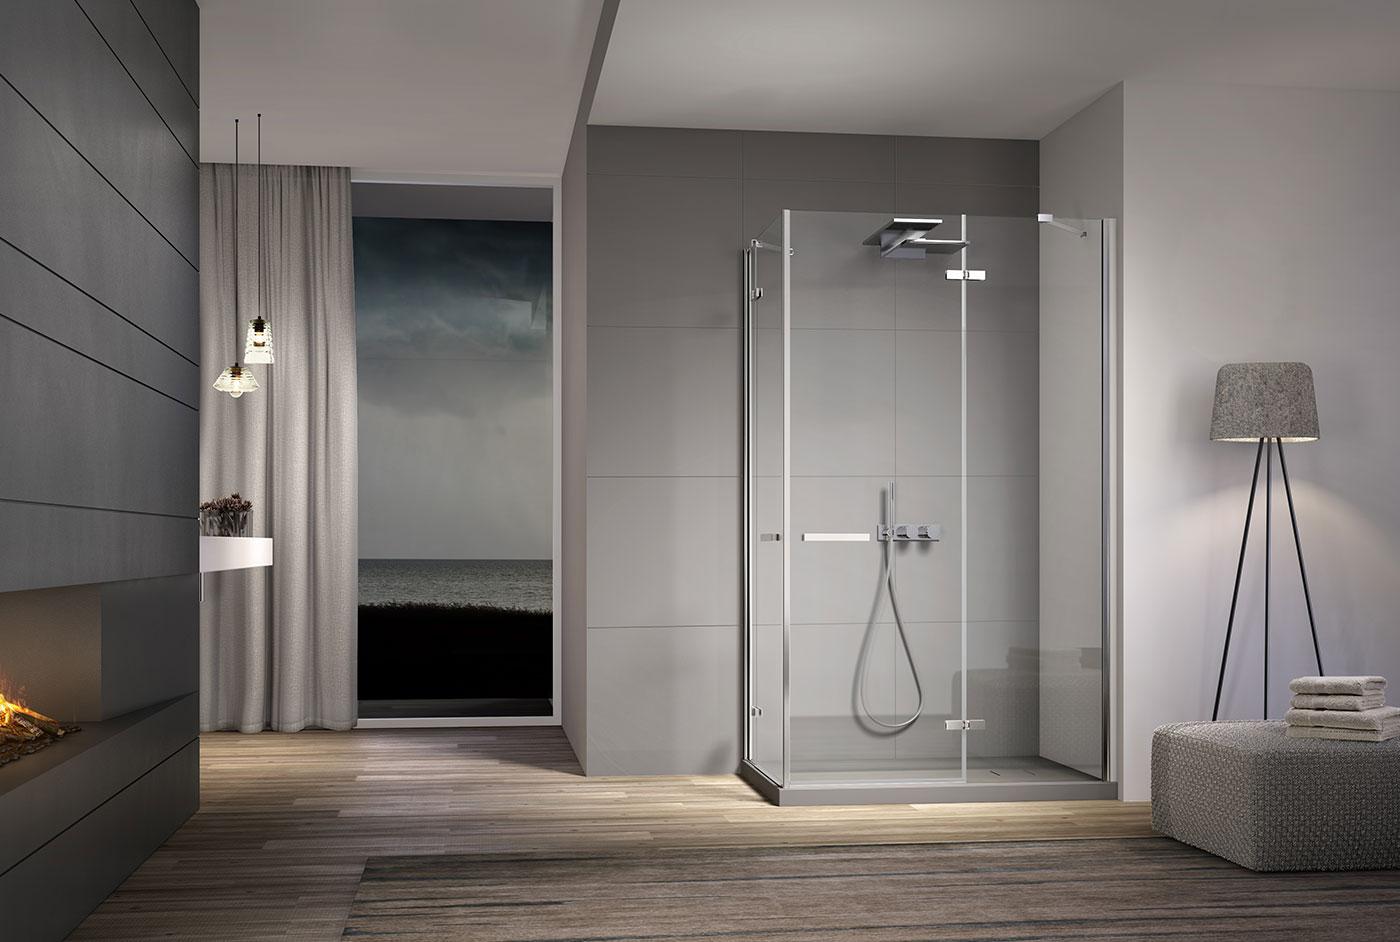 Douche Italienne De Salle De Bain BATH Room